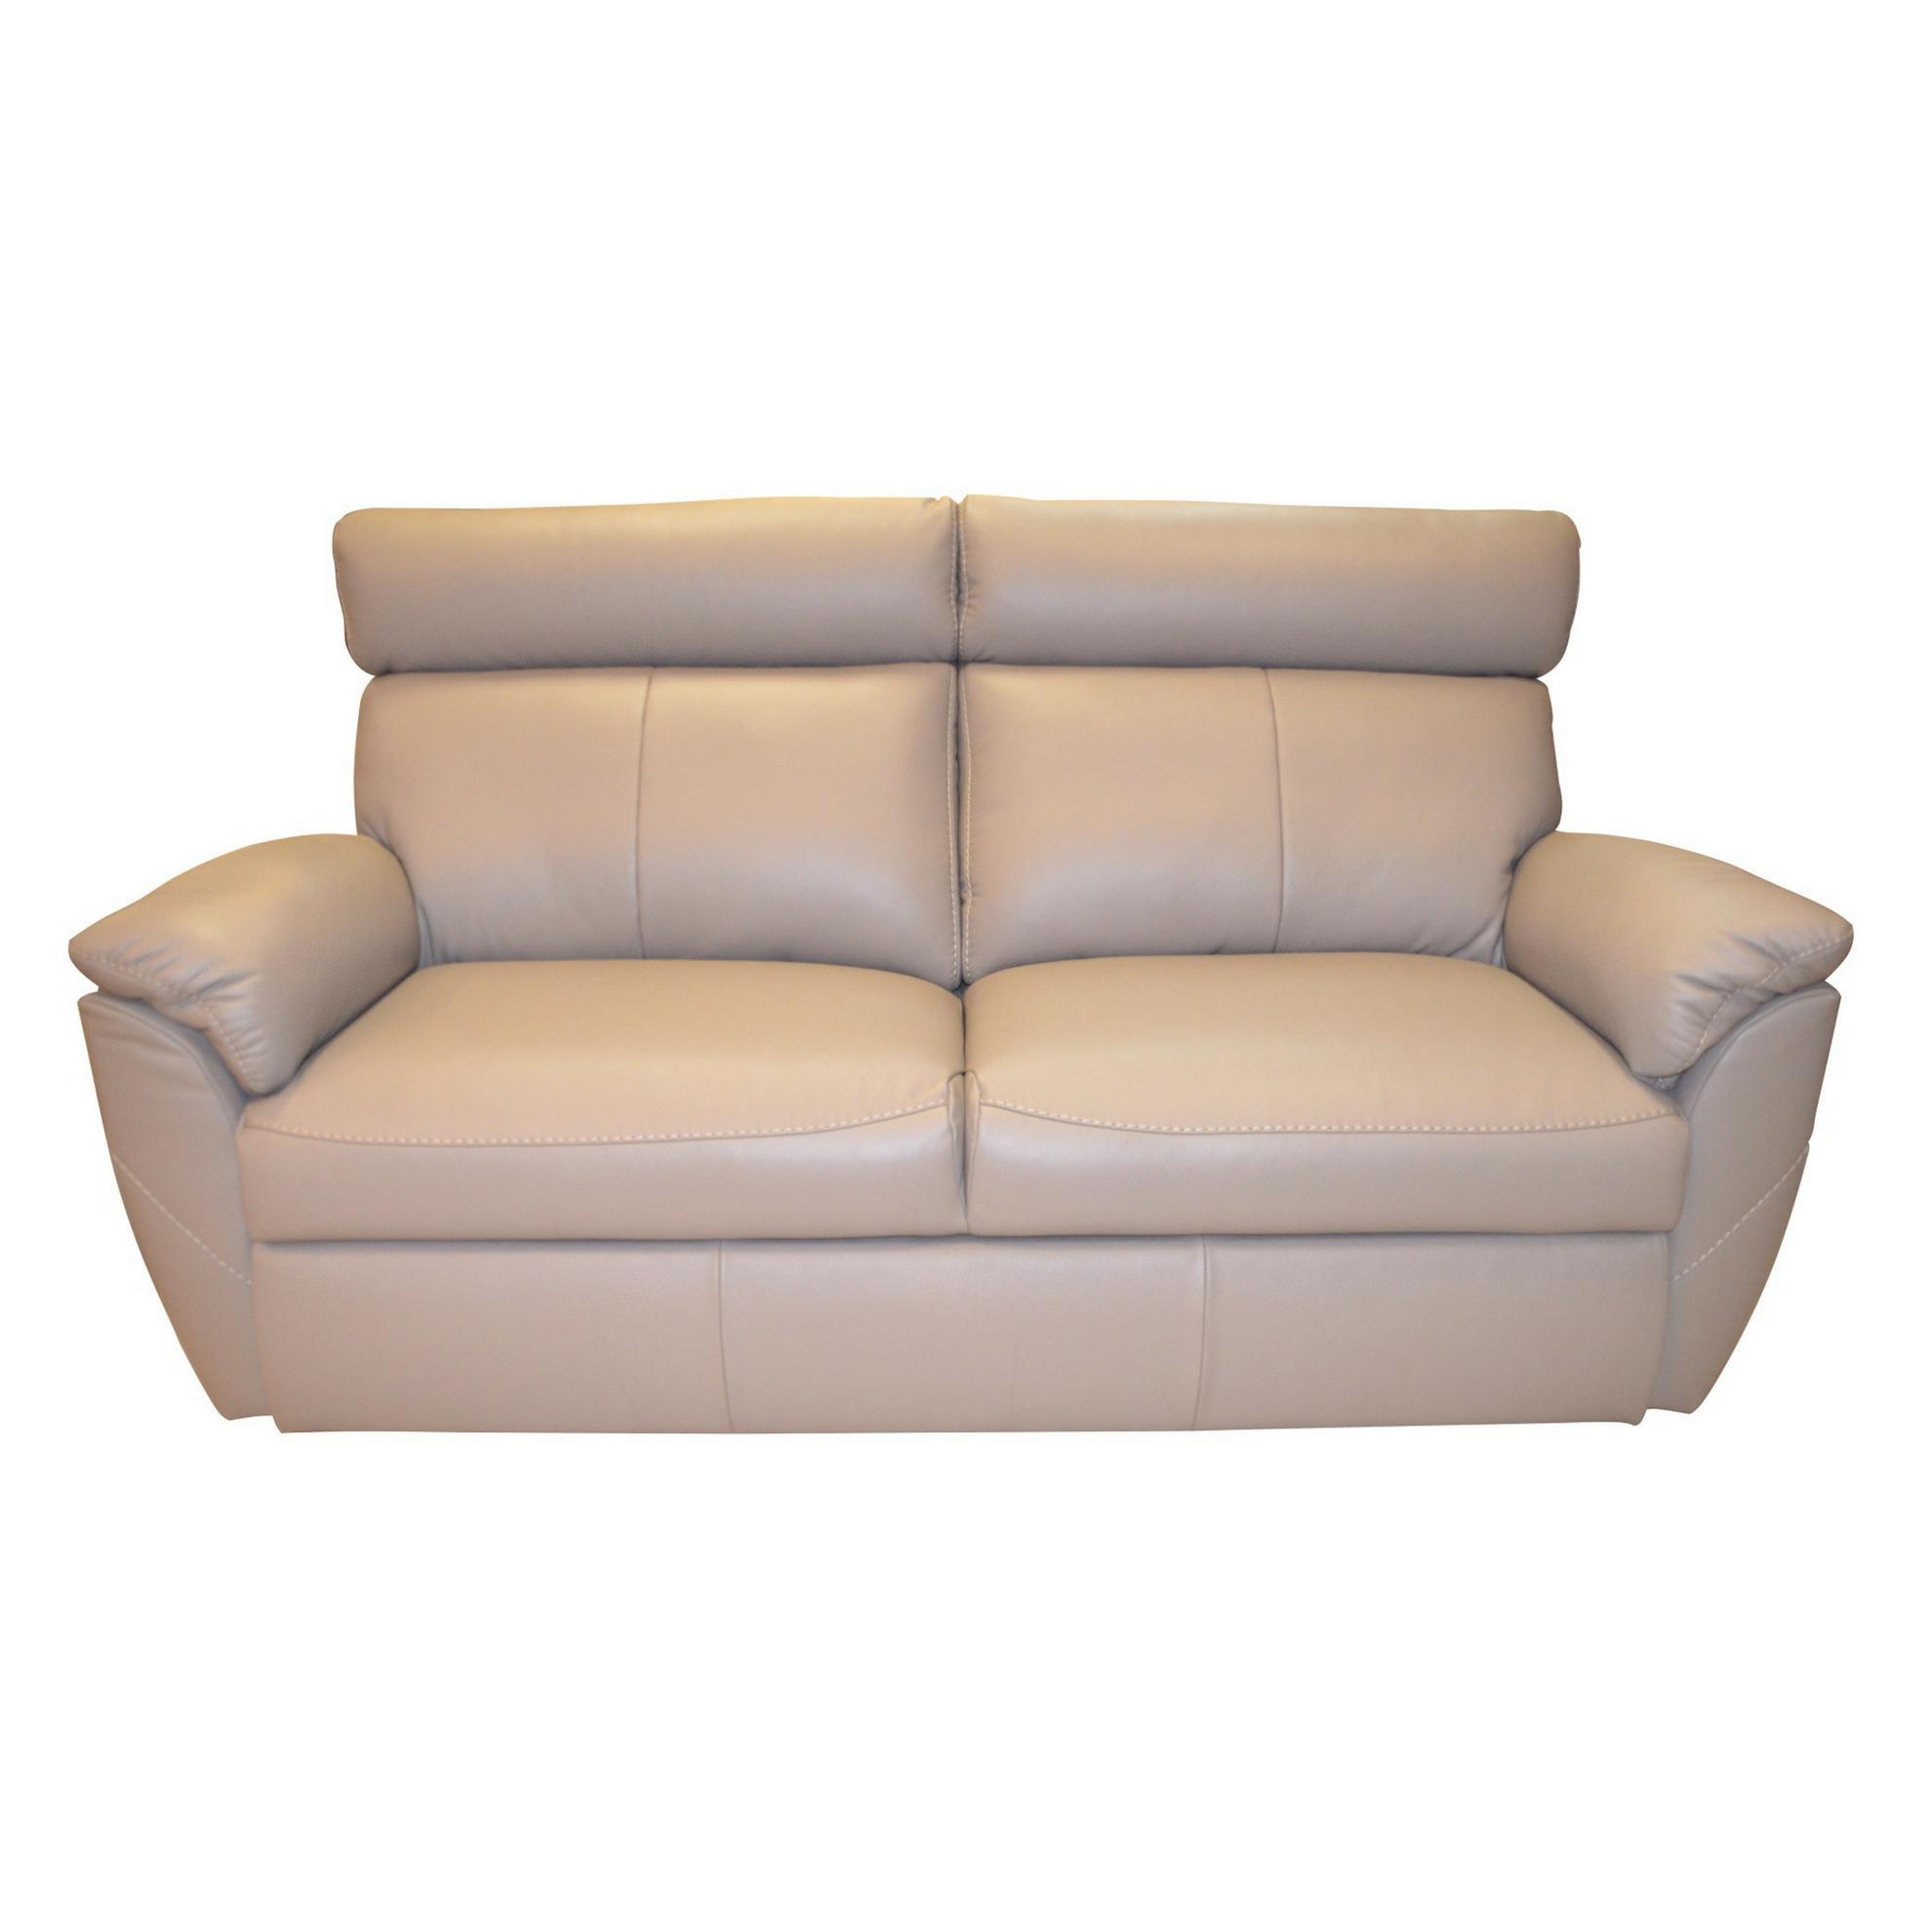 Porto 3 seat Sofa bed 4